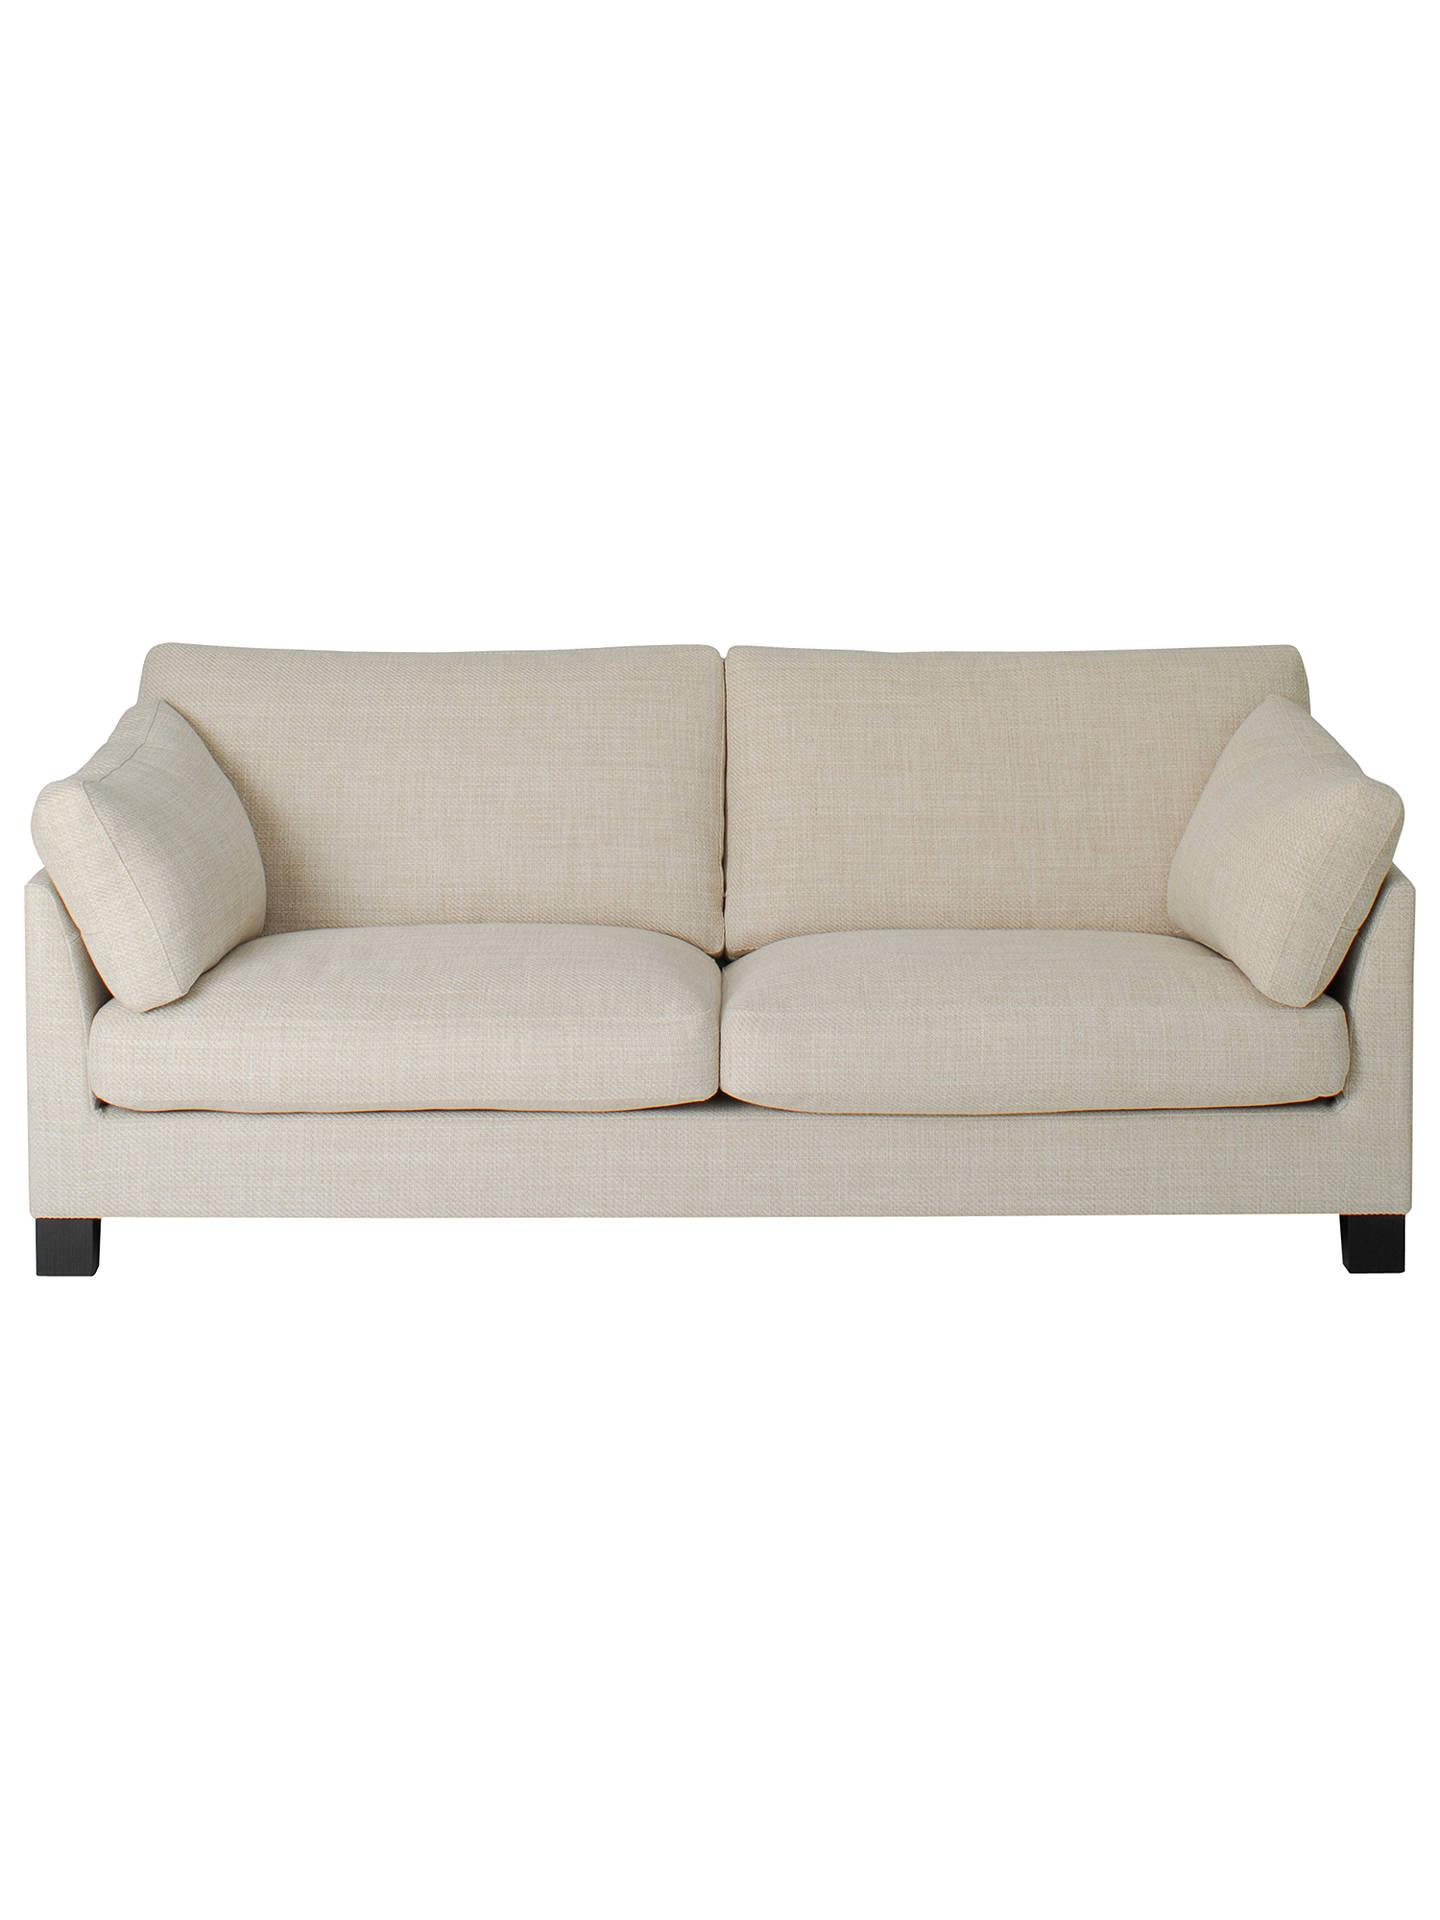 john lewis ikon sofa review. Black Bedroom Furniture Sets. Home Design Ideas